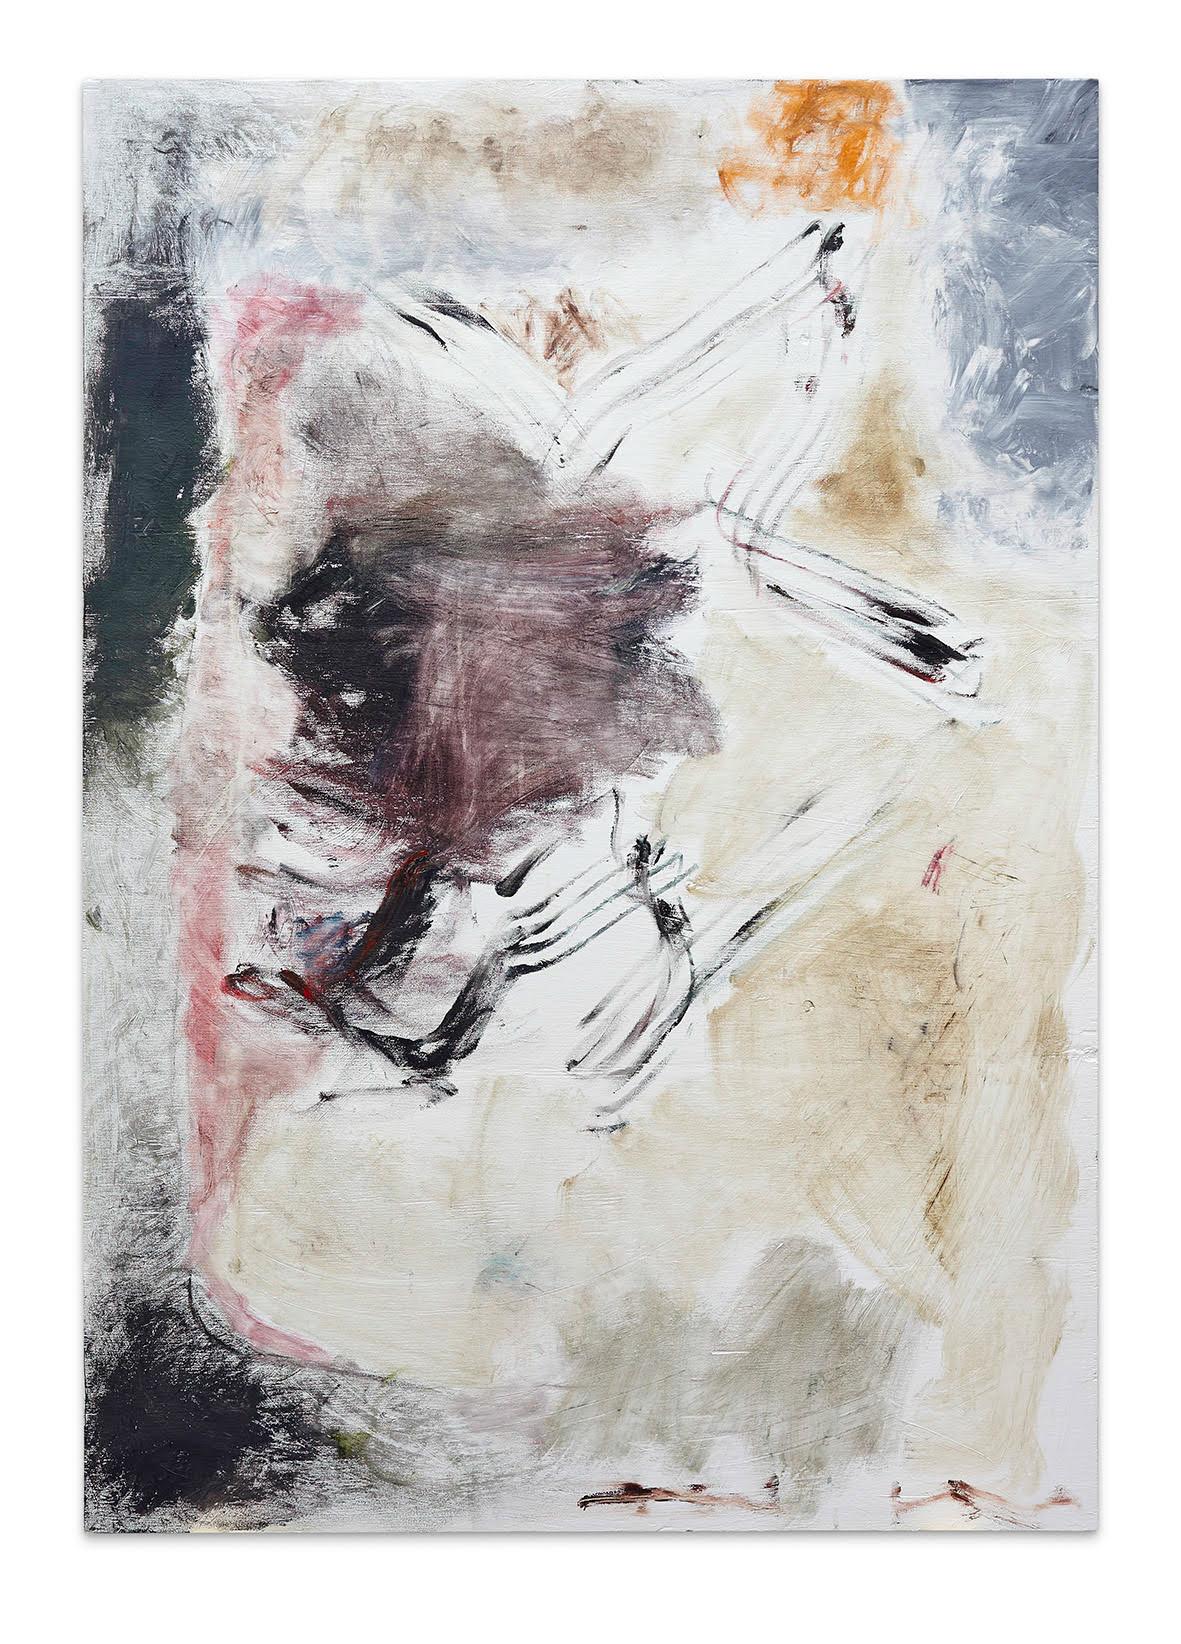 Joaquín Boz. <em>Untitledm</em>, 2016. Oil on panel, 53 x 37 1/2 inches (134.6 x 95.3 cm)